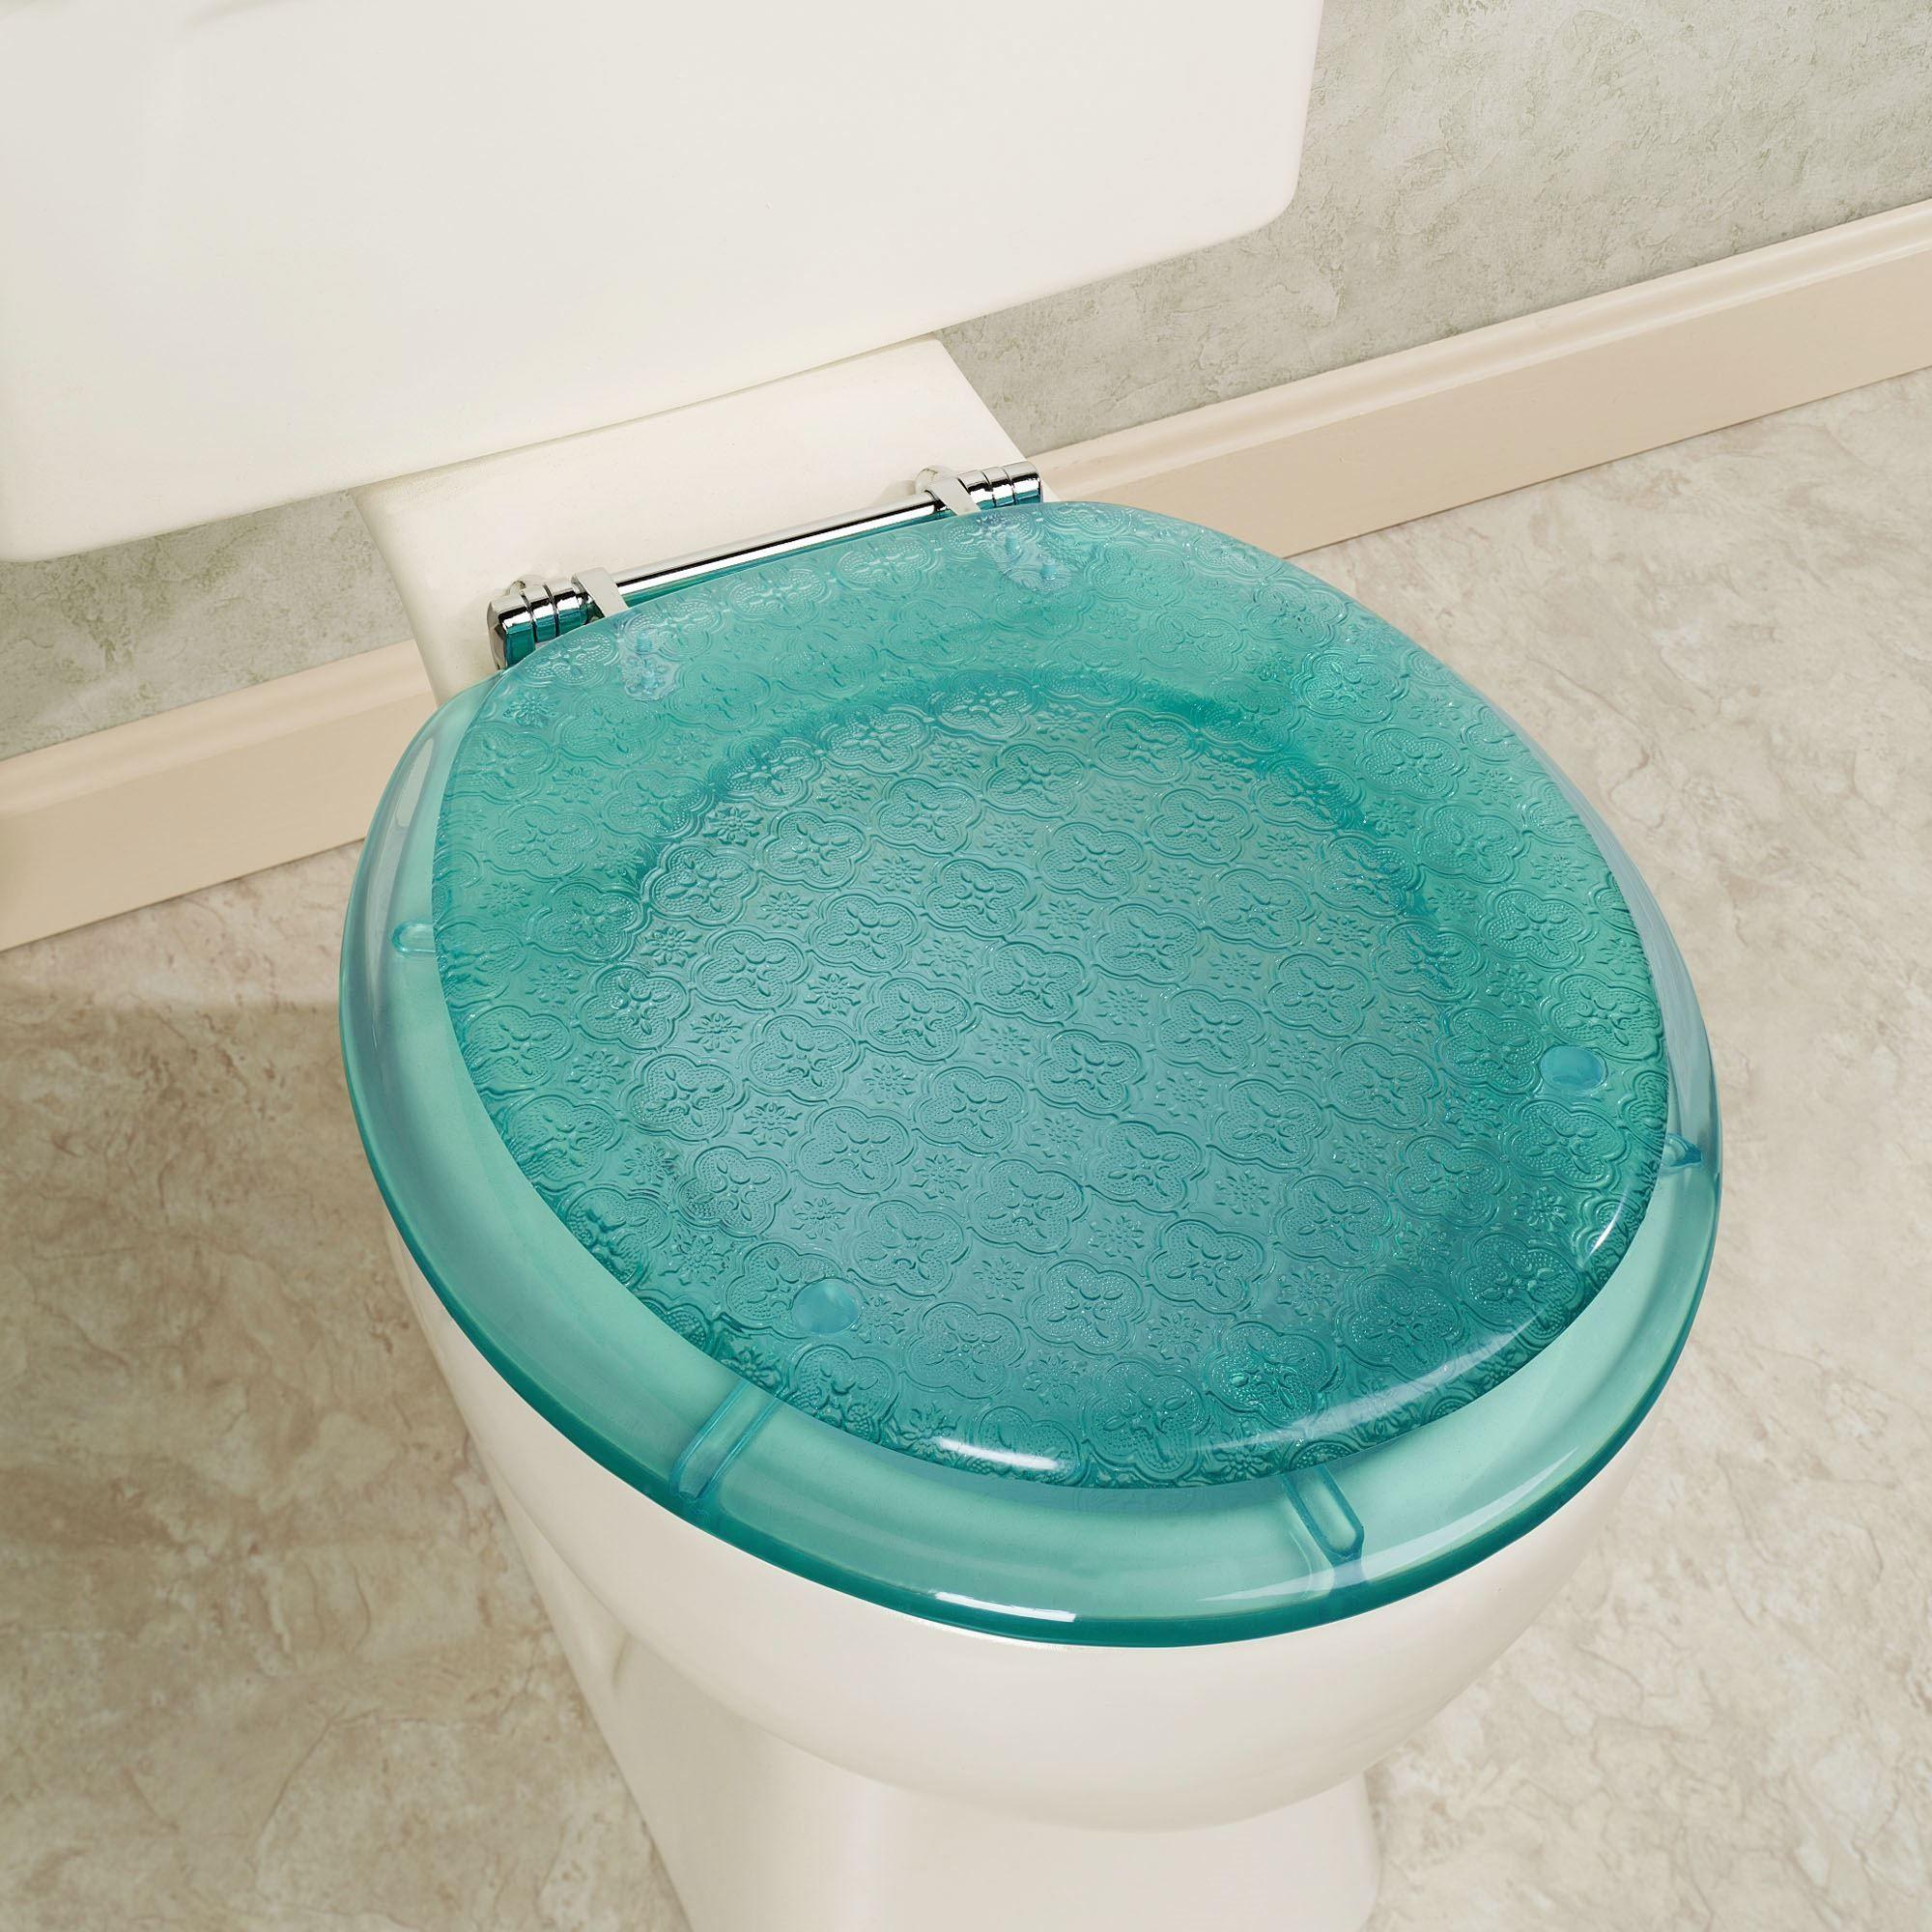 Outstanding Decorative Toilet Seat Svwilp Nl Creativecarmelina Interior Chair Design Creativecarmelinacom